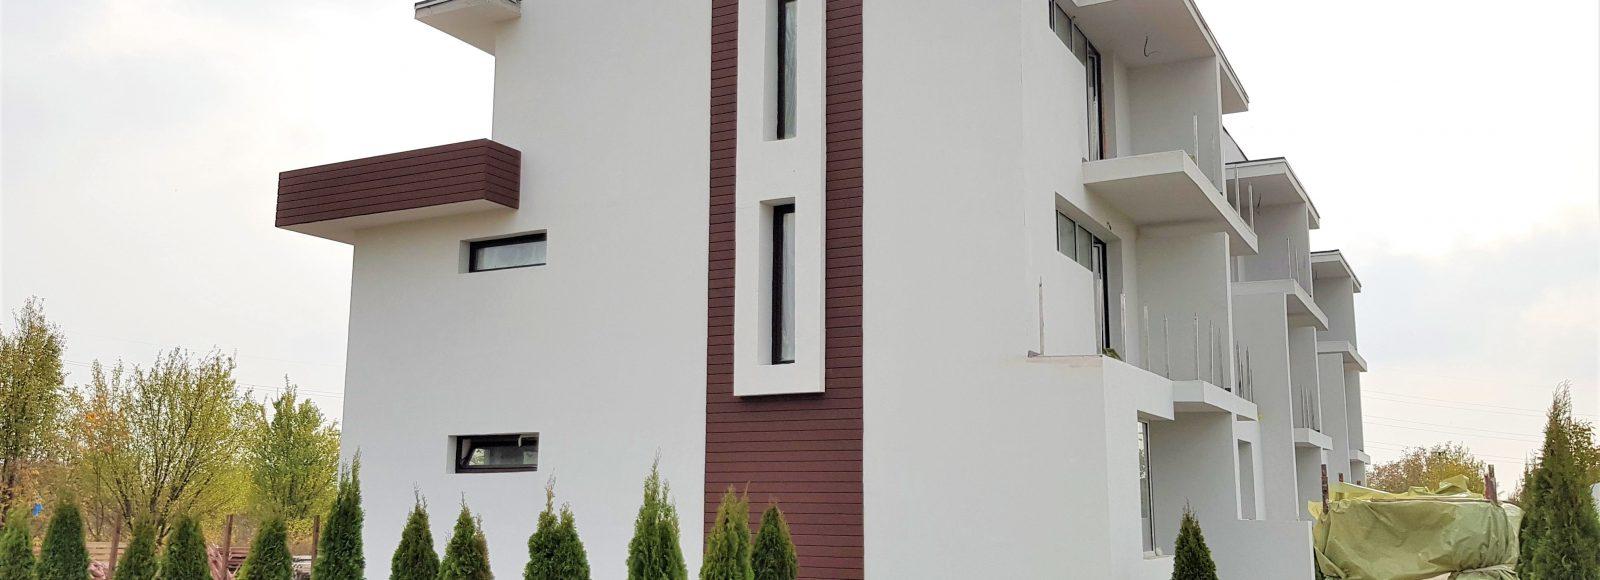 case noi Popesti Sunset Villas vedere laterala